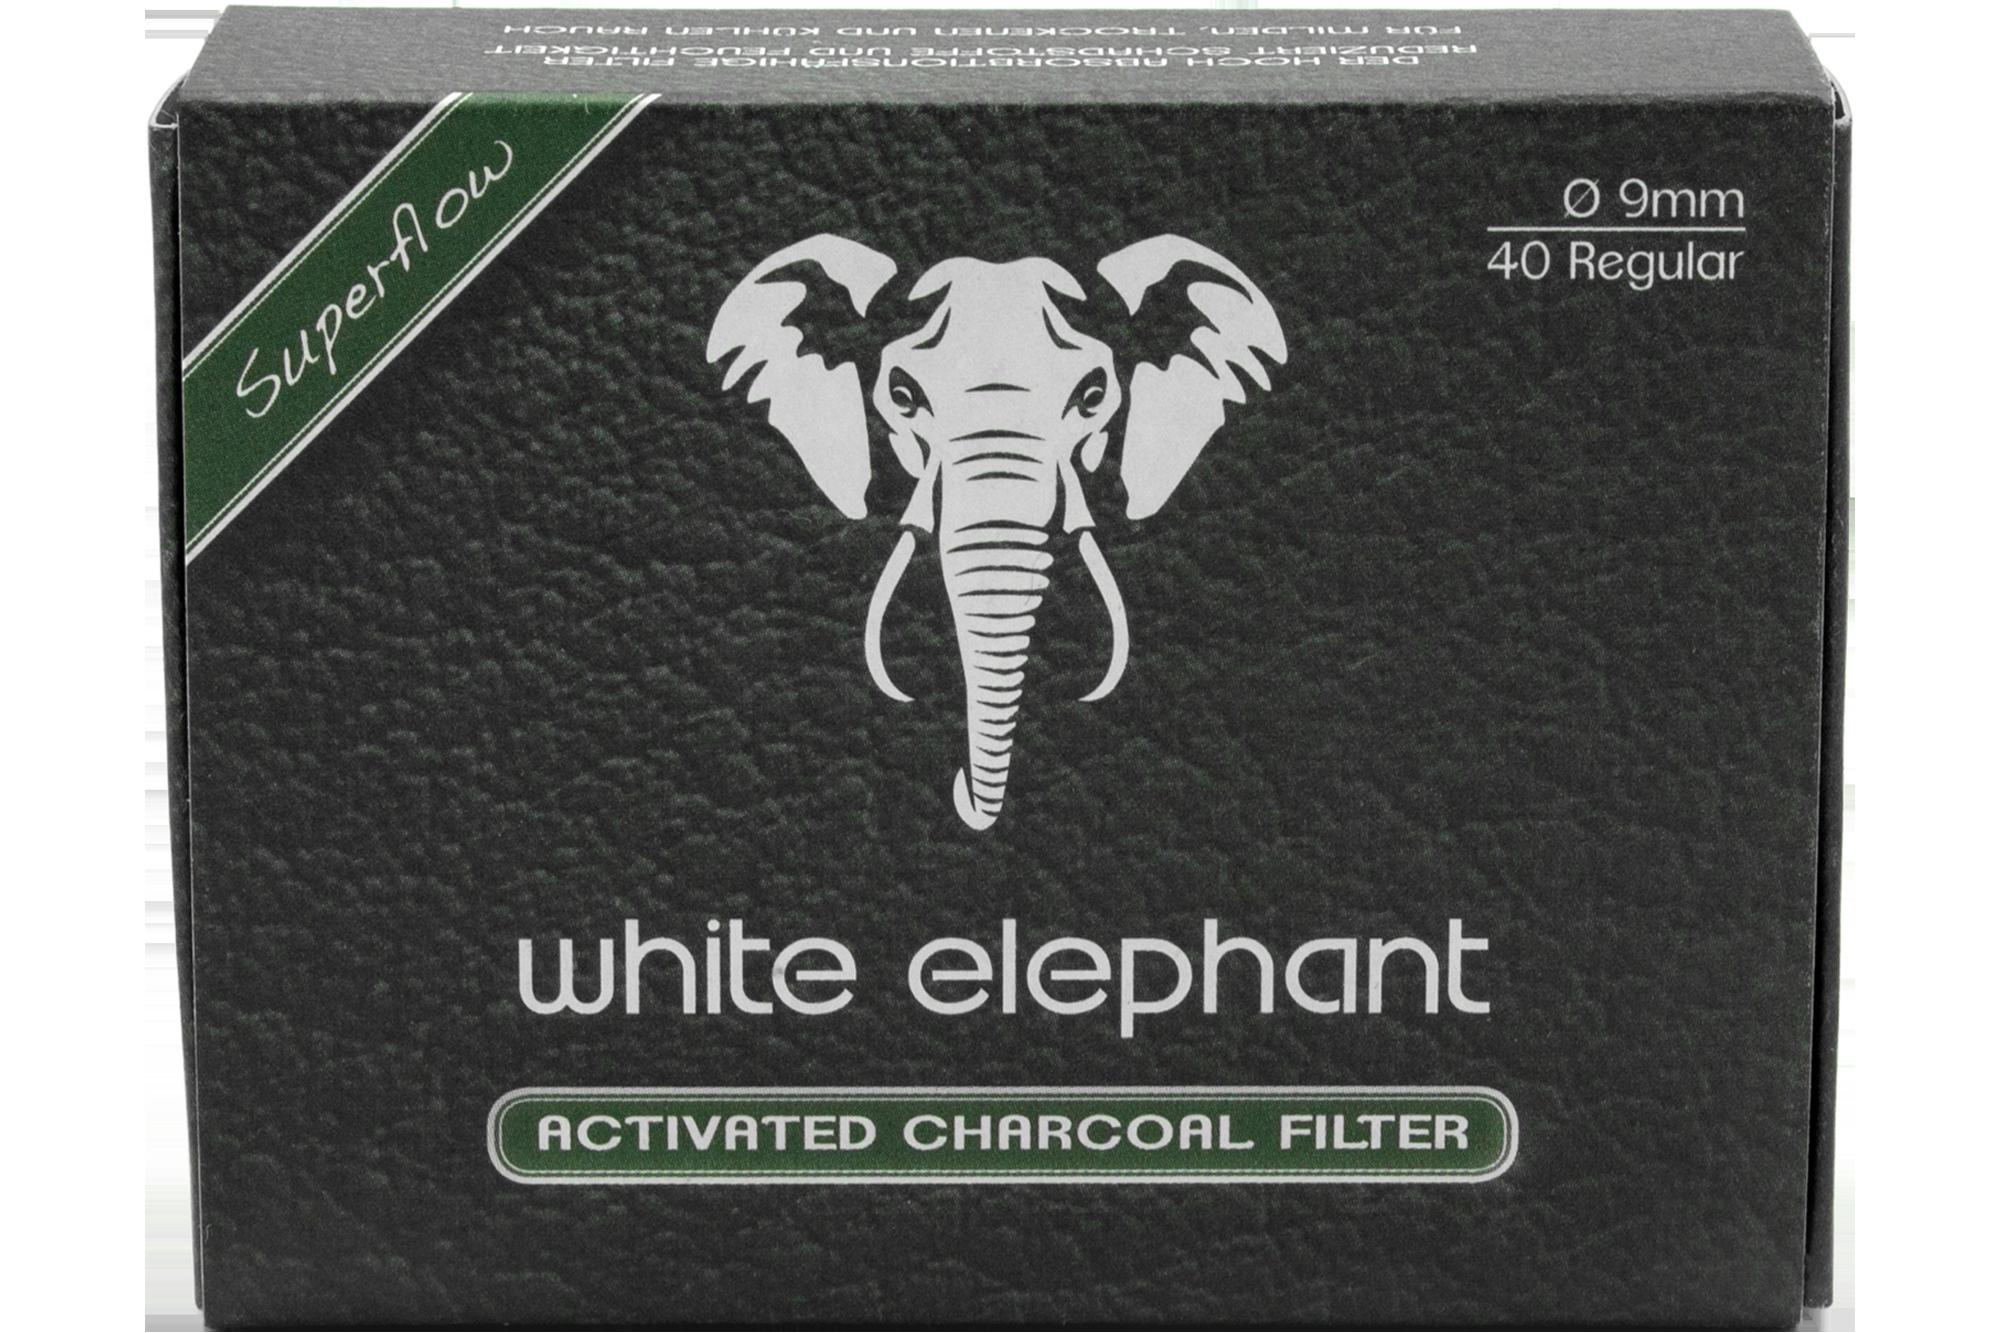 Zigarrenhaus Sturm   White Elephant 20 Activated Charcoal Filter 20mm    Tabak, Kautabak, Zigarren, Zigaretten, Zigarillos, Wasserpfeifen,  Schnupftabak, ...